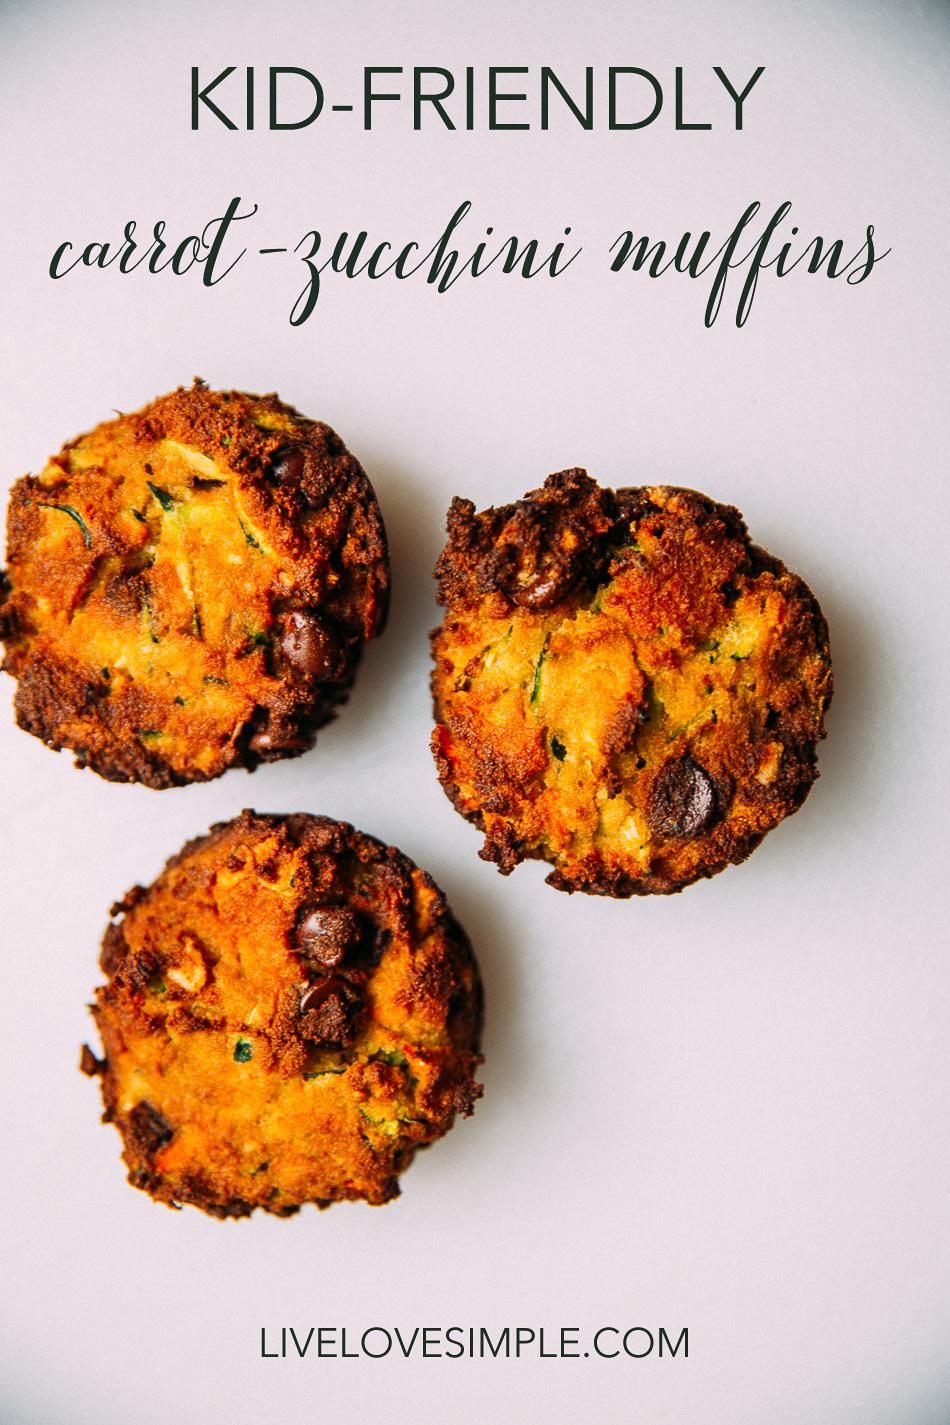 Kid-Friendly Carrot-Zucchini Muffins// livelovesimple.com